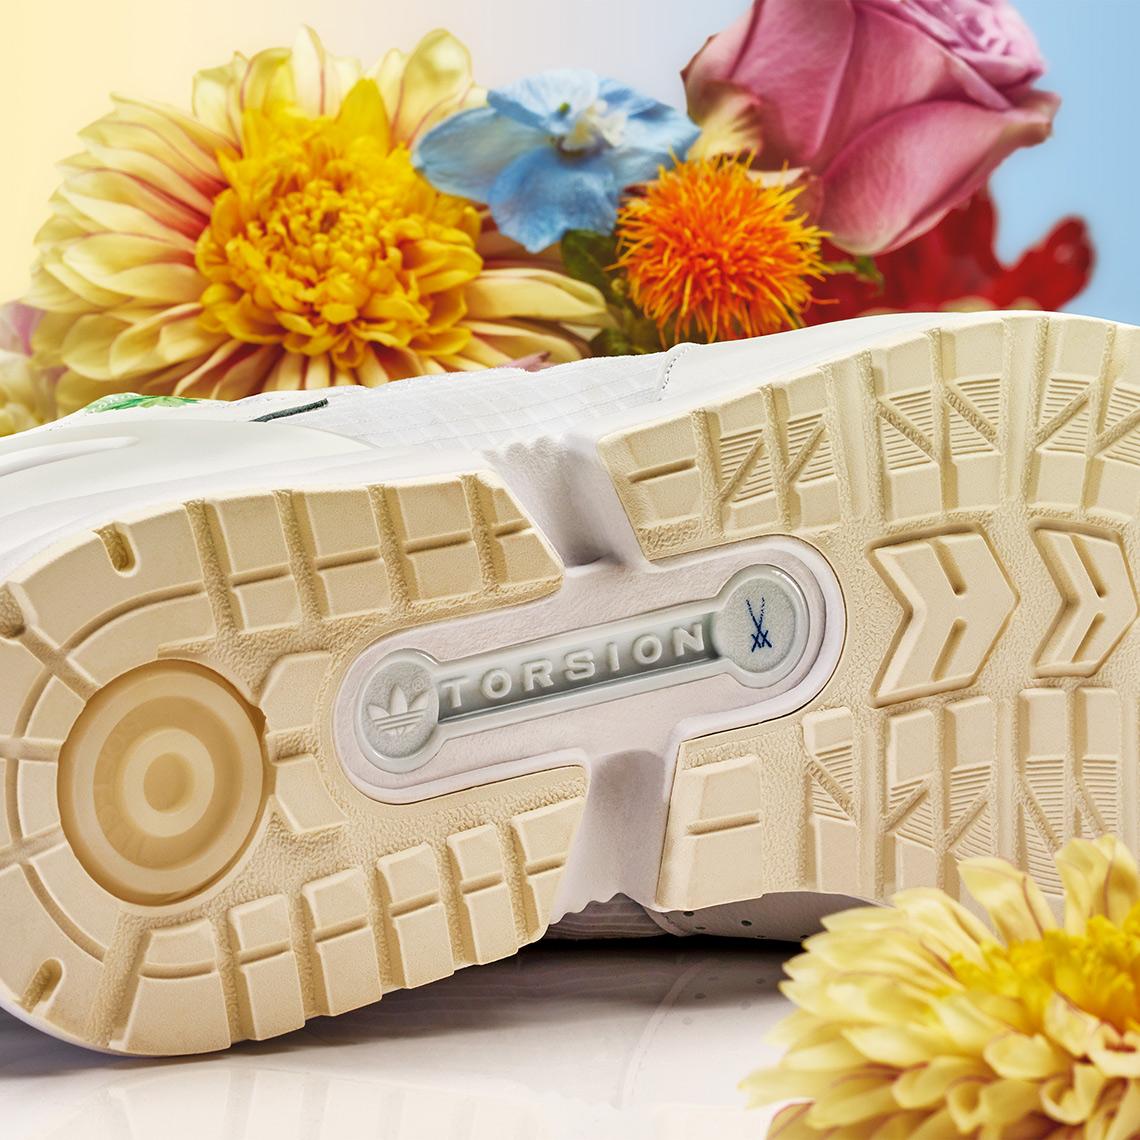 meissen-adidas-zx10000c-FZ4888-release-date-5.jpg?w=1140